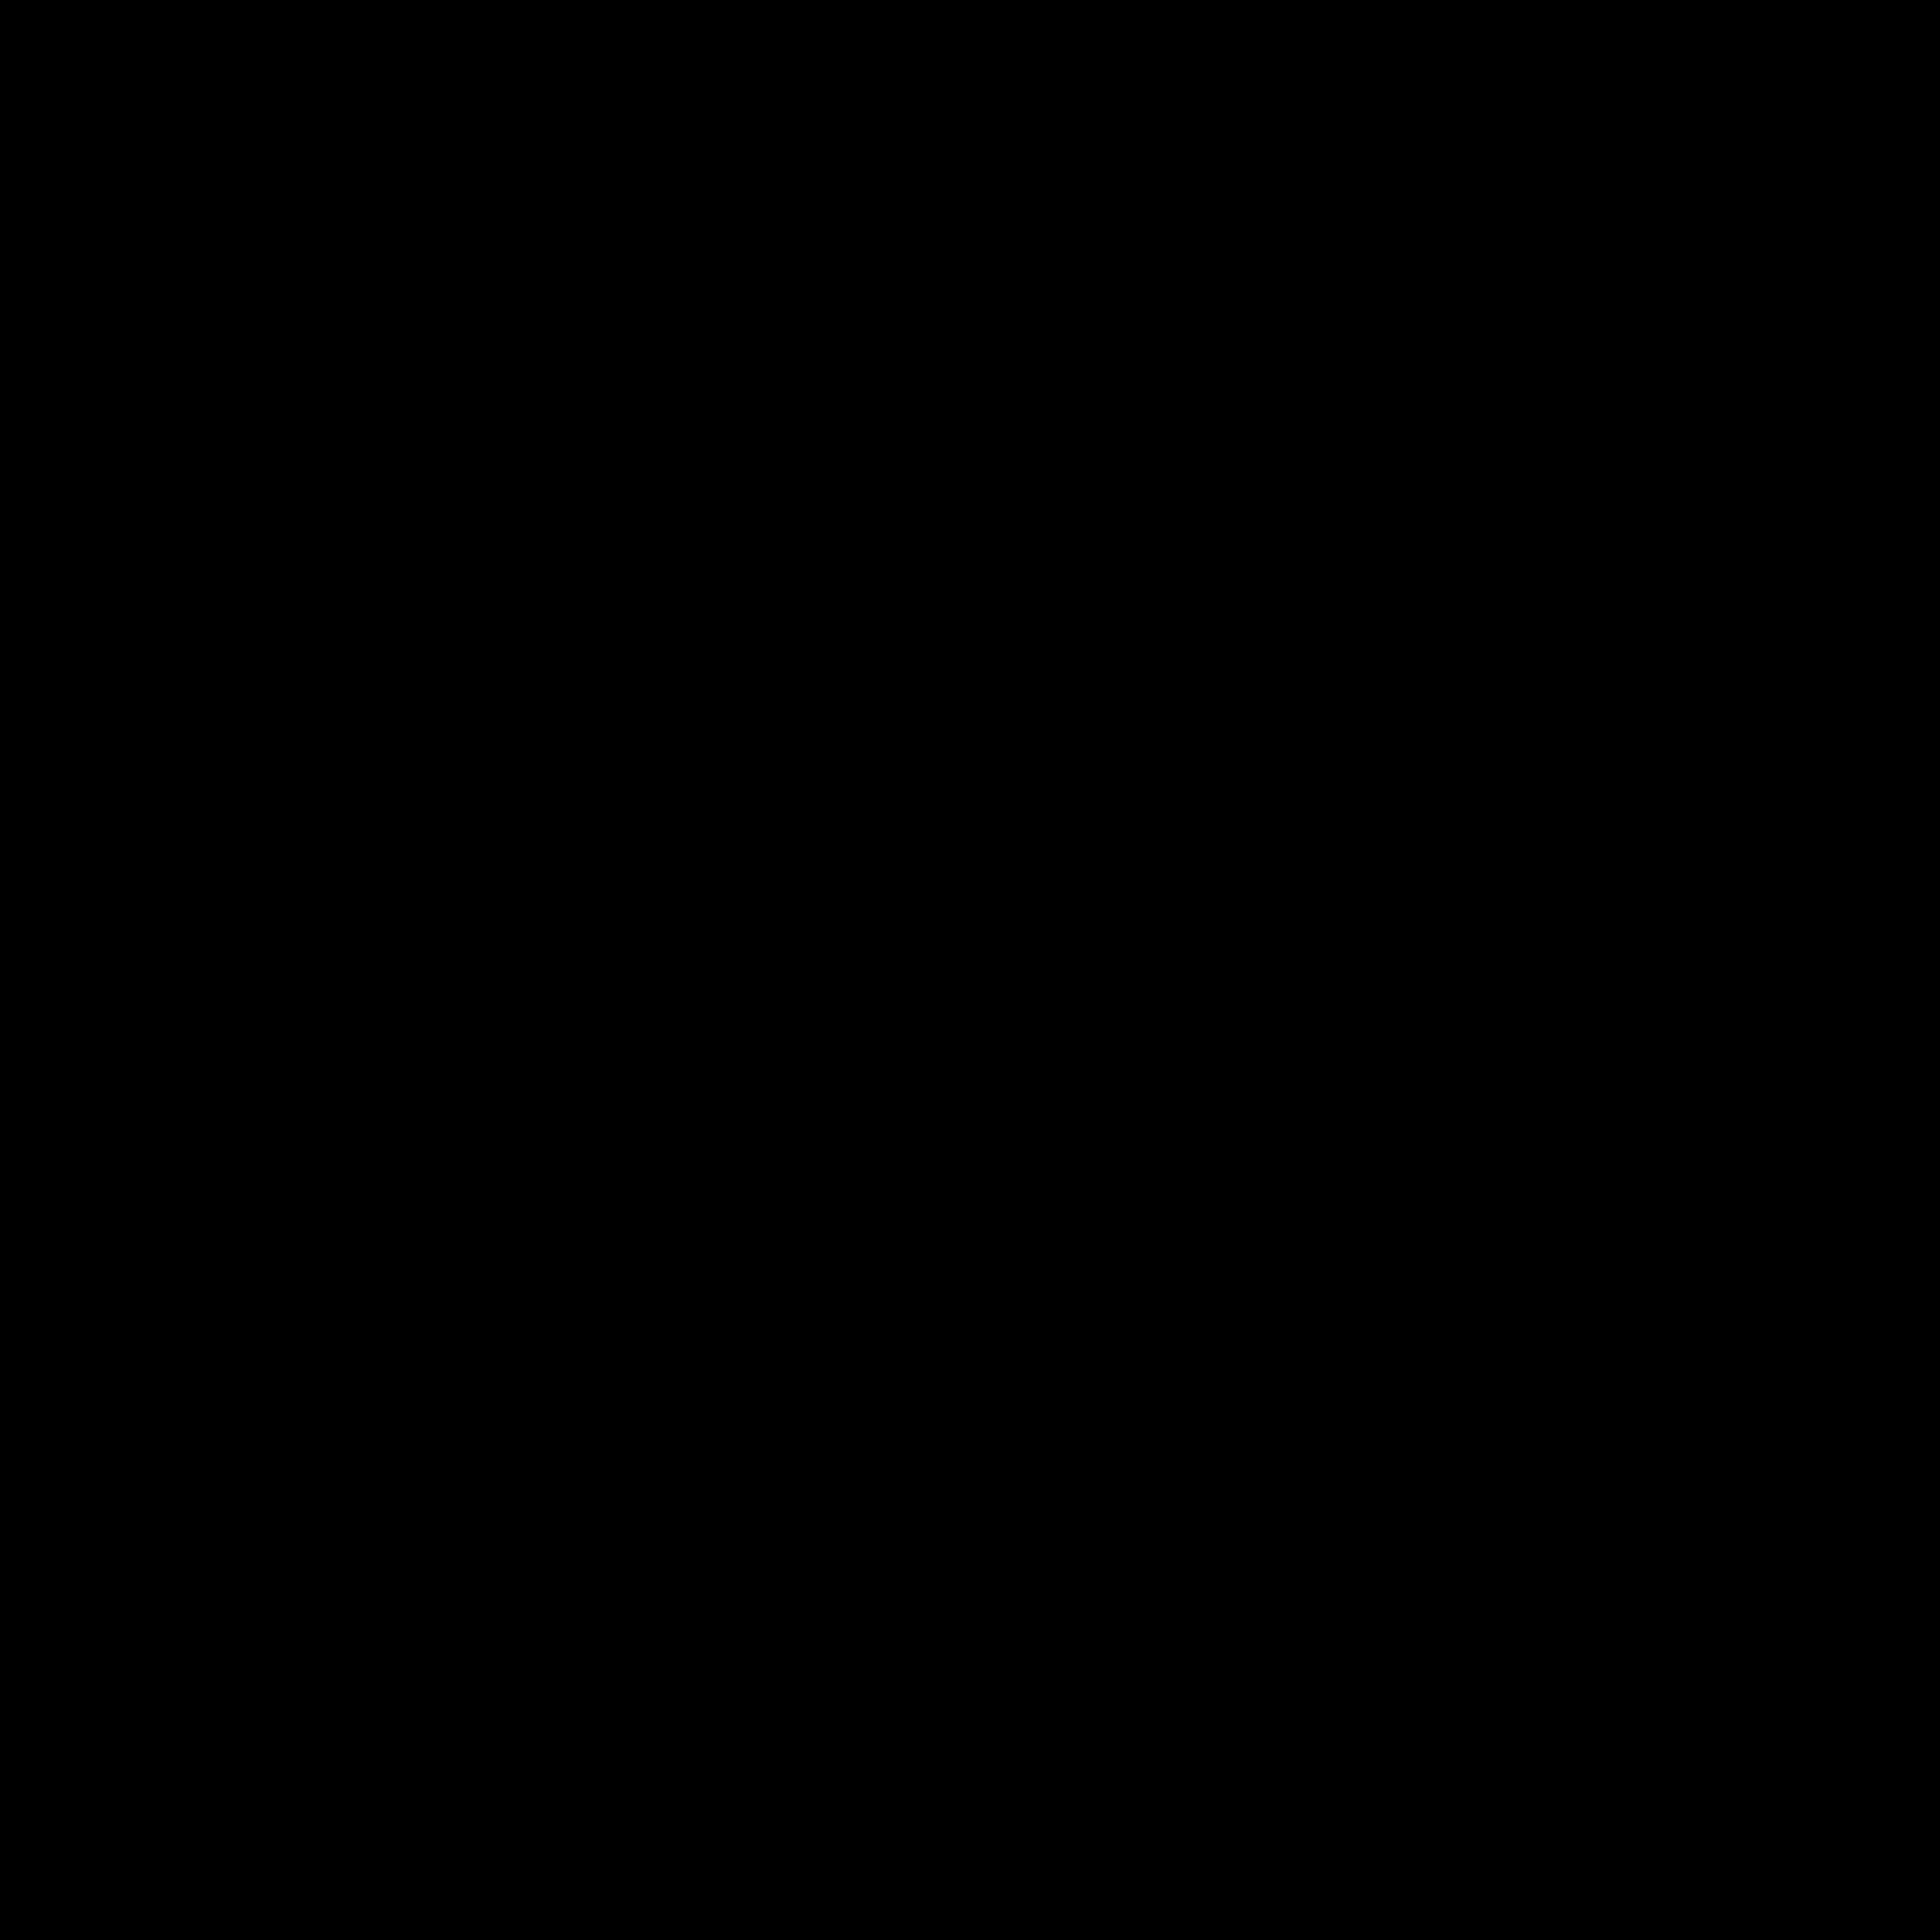 Veuve Clicquot Ponsardin Logo PNG Transparent & SVG Vector.